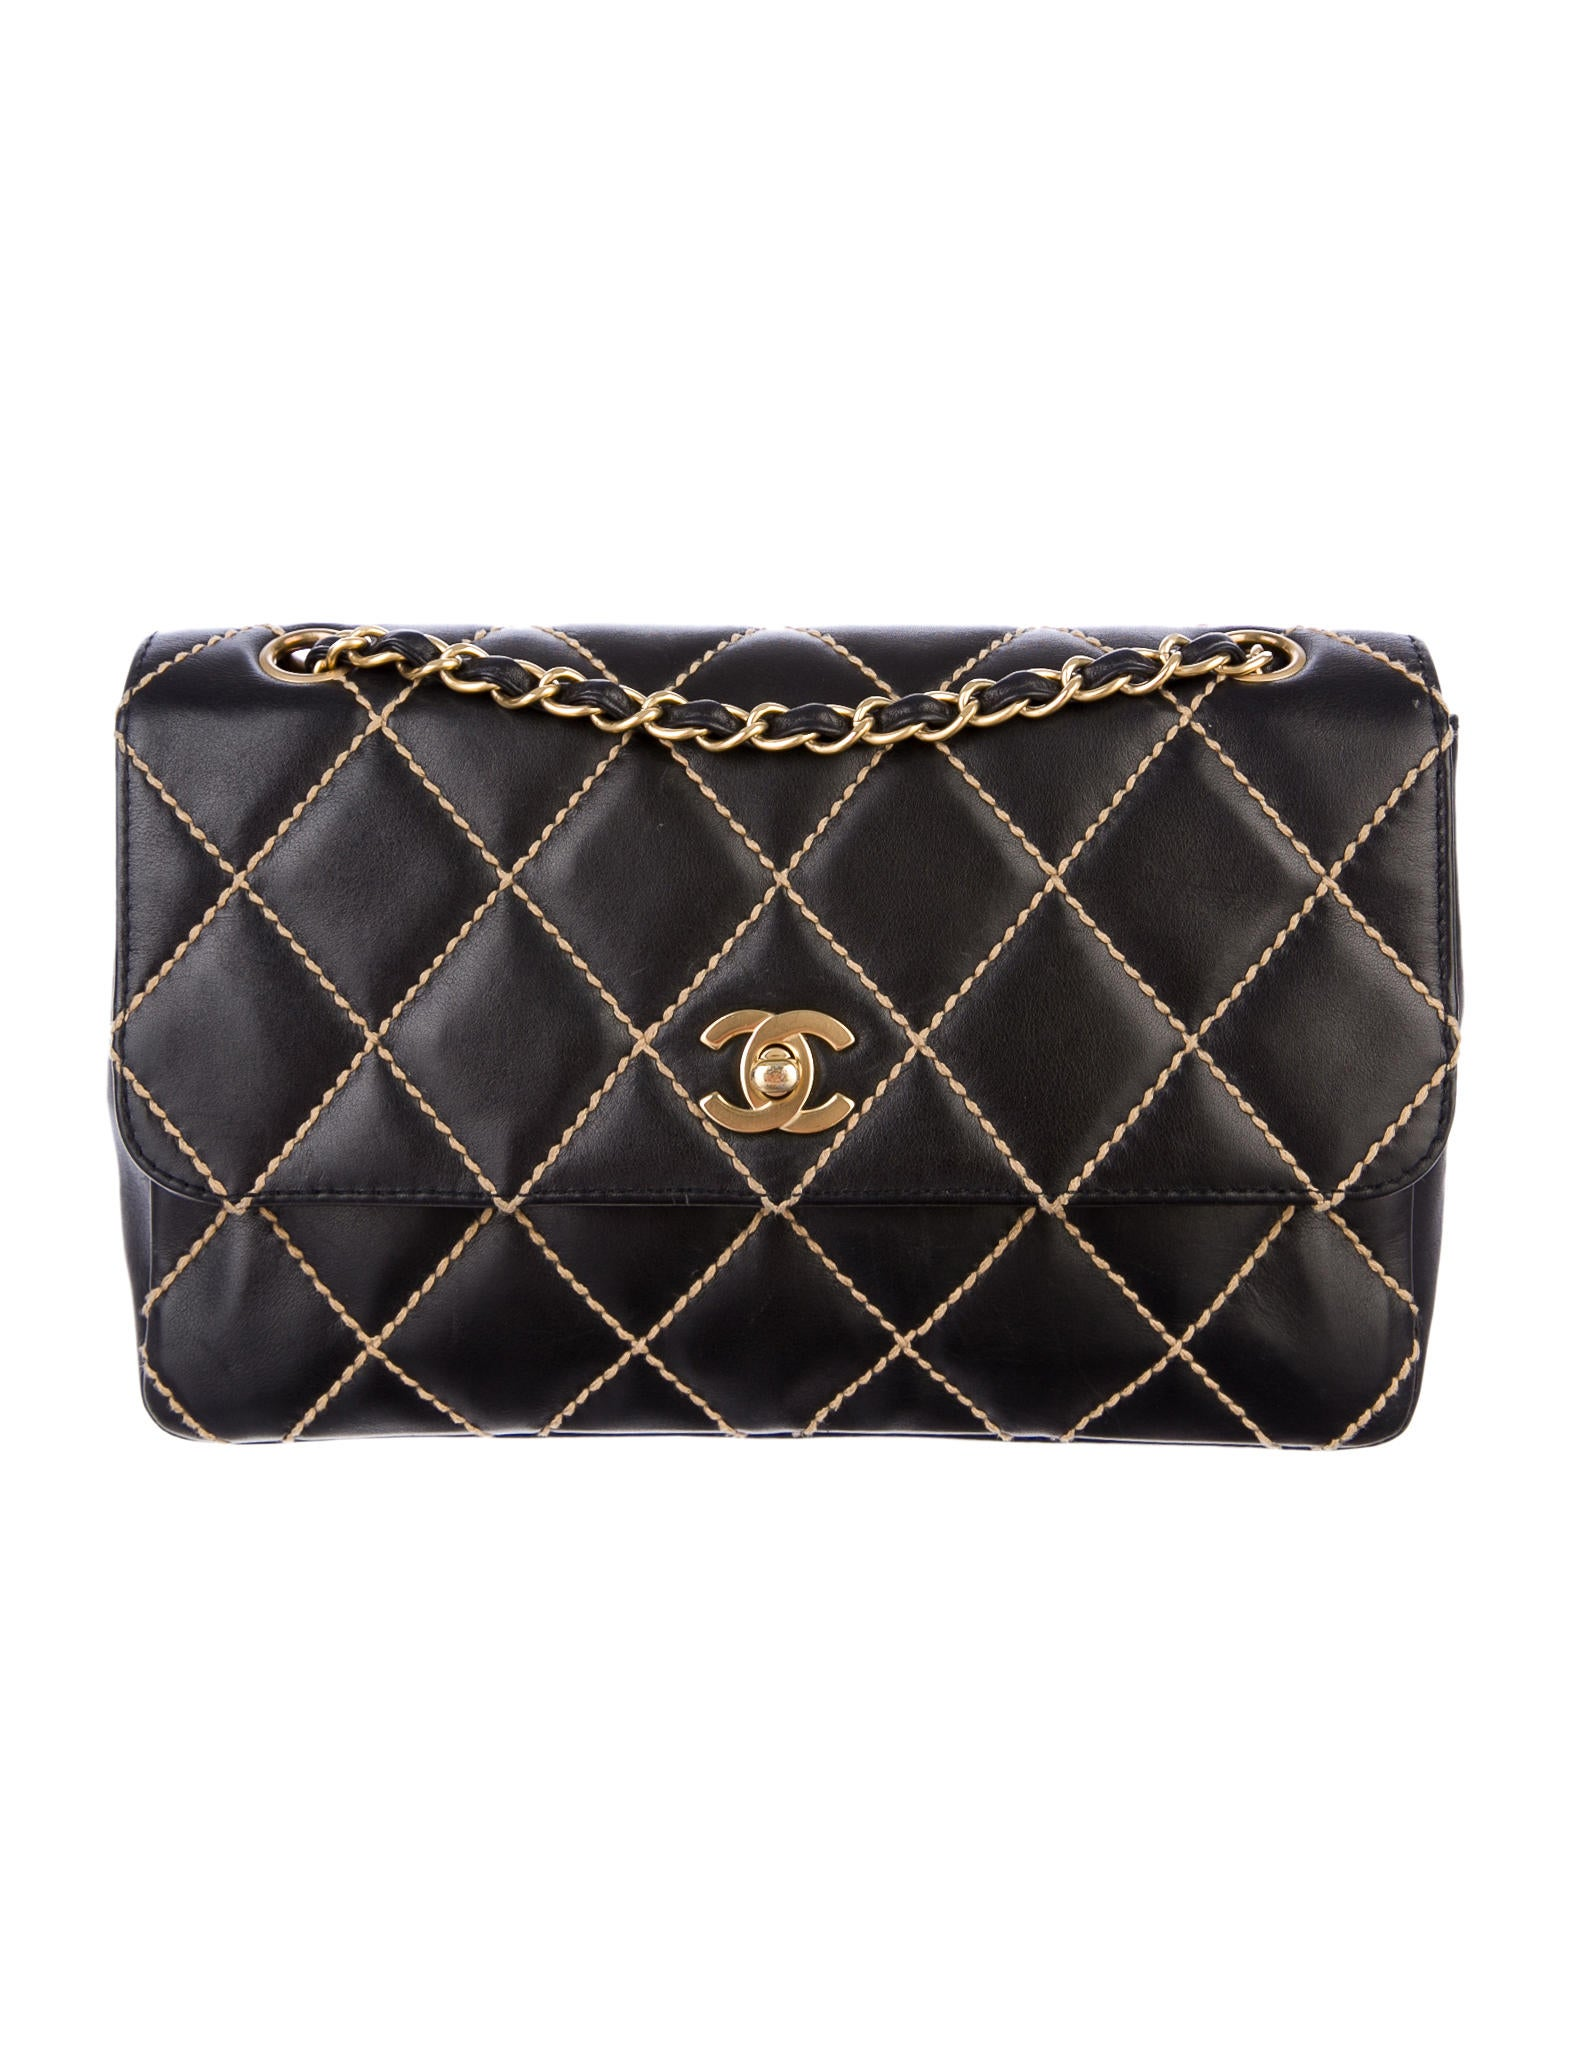 dd216c94752a Chanel Surpique Flap Bag - Handbags - CHA57112 | The RealReal